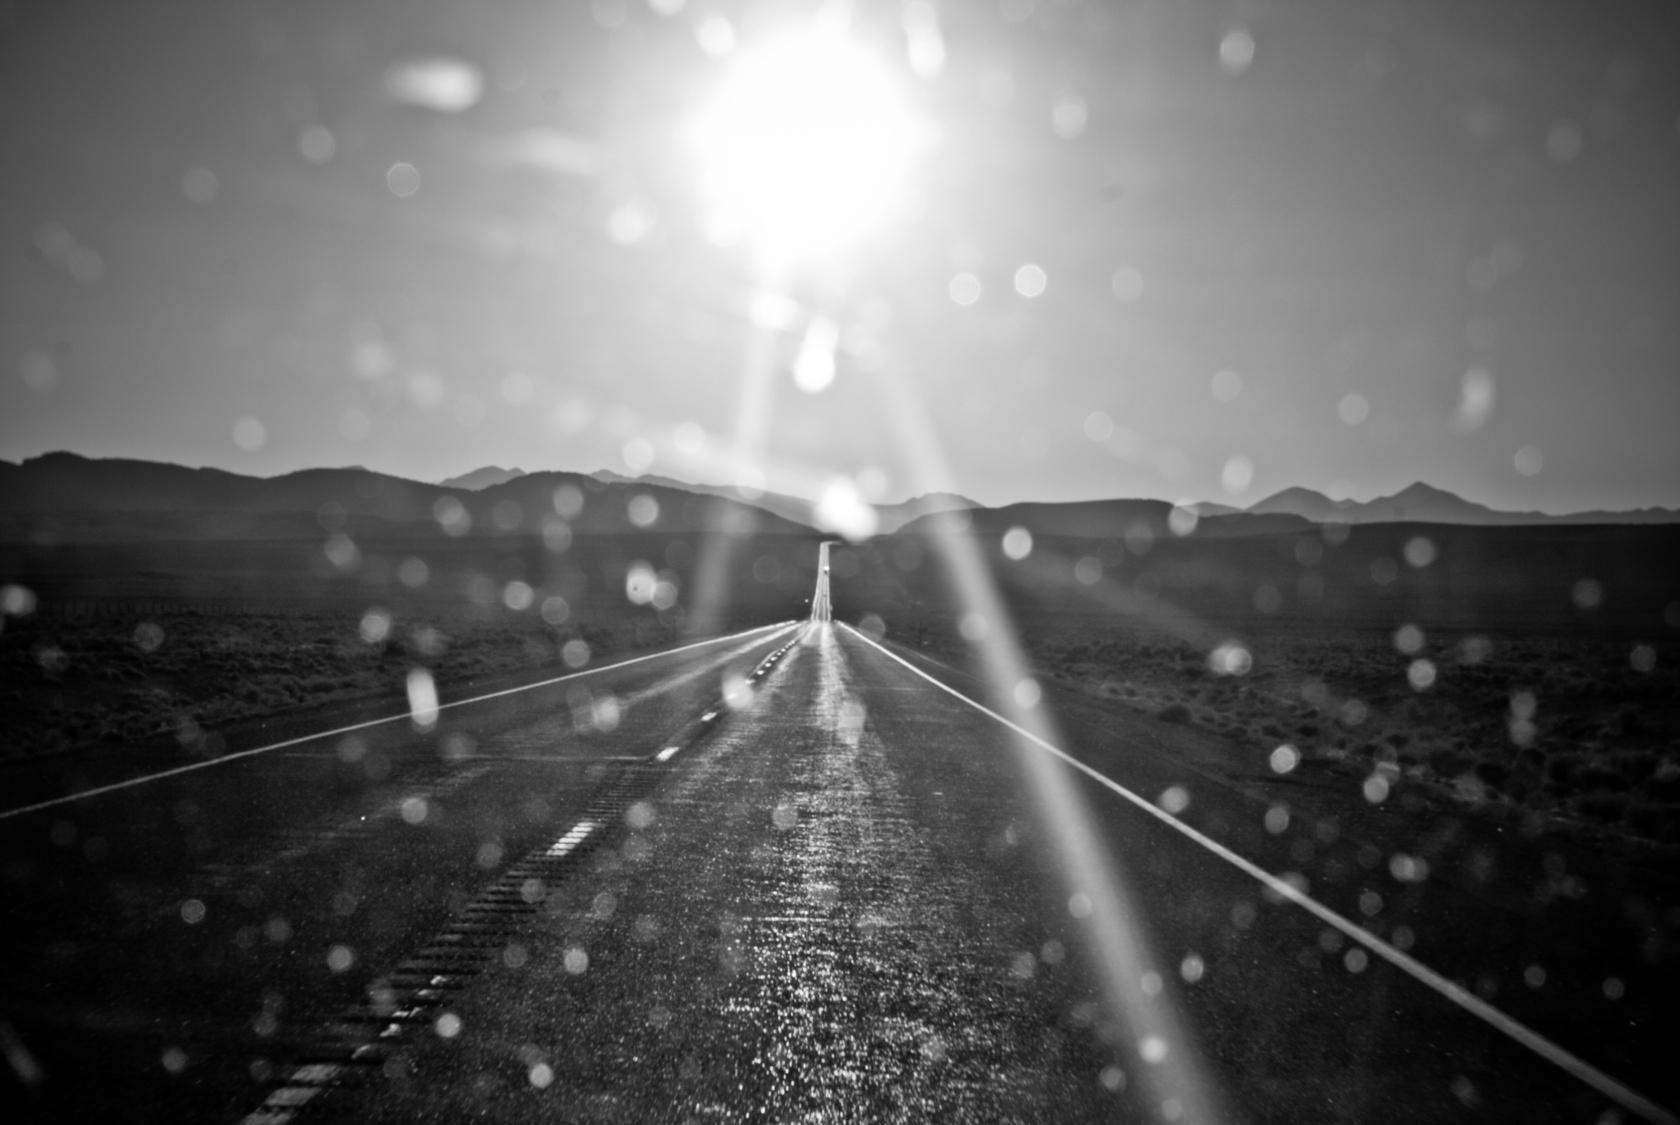 brudna szyba / a dirty windscreen